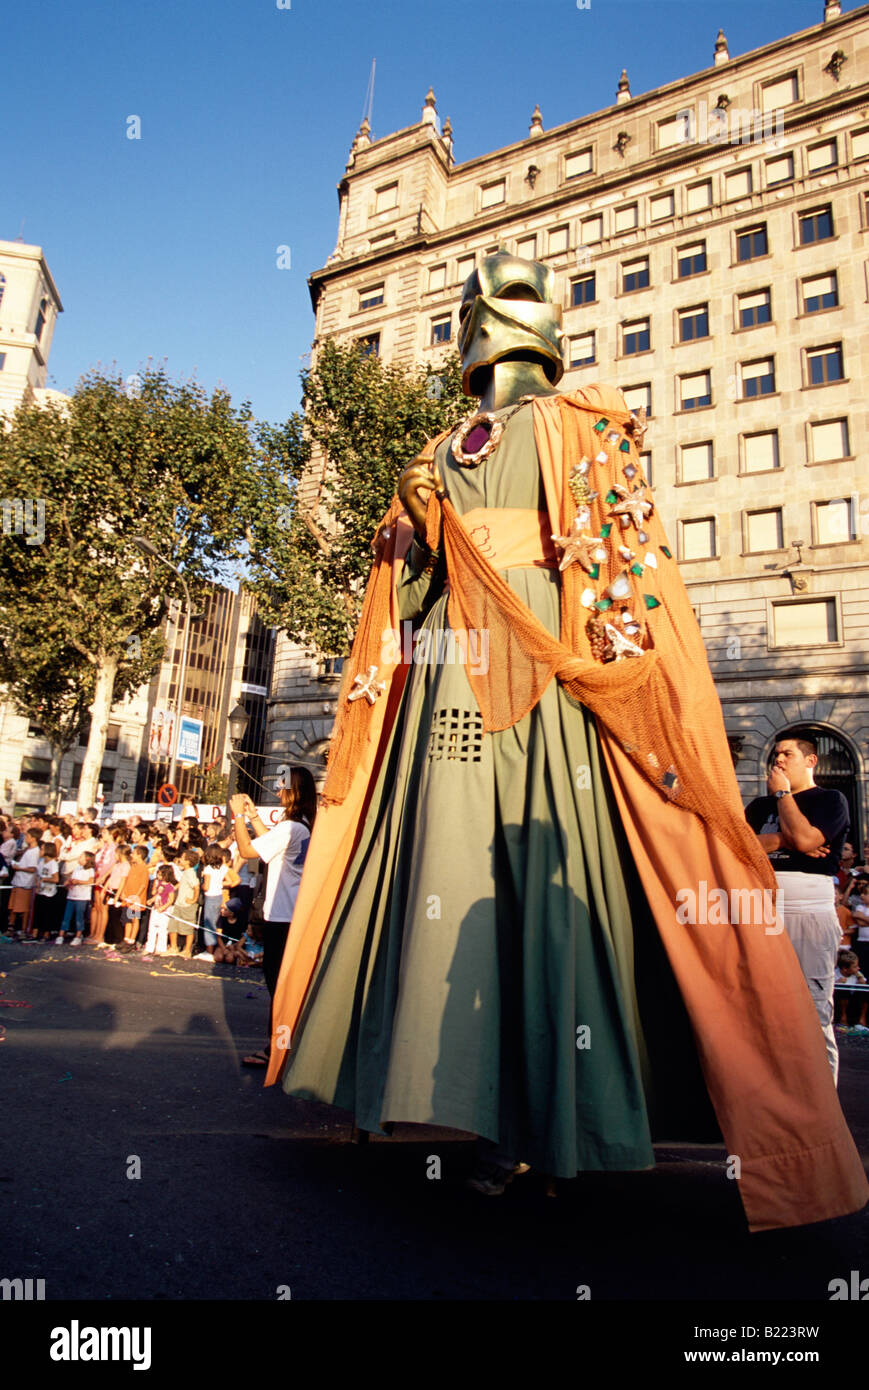 Gegantes 5m parata dei giganti a Placa Reial Festa de la merce a Barcellona Catalonia Spagna Foto Stock